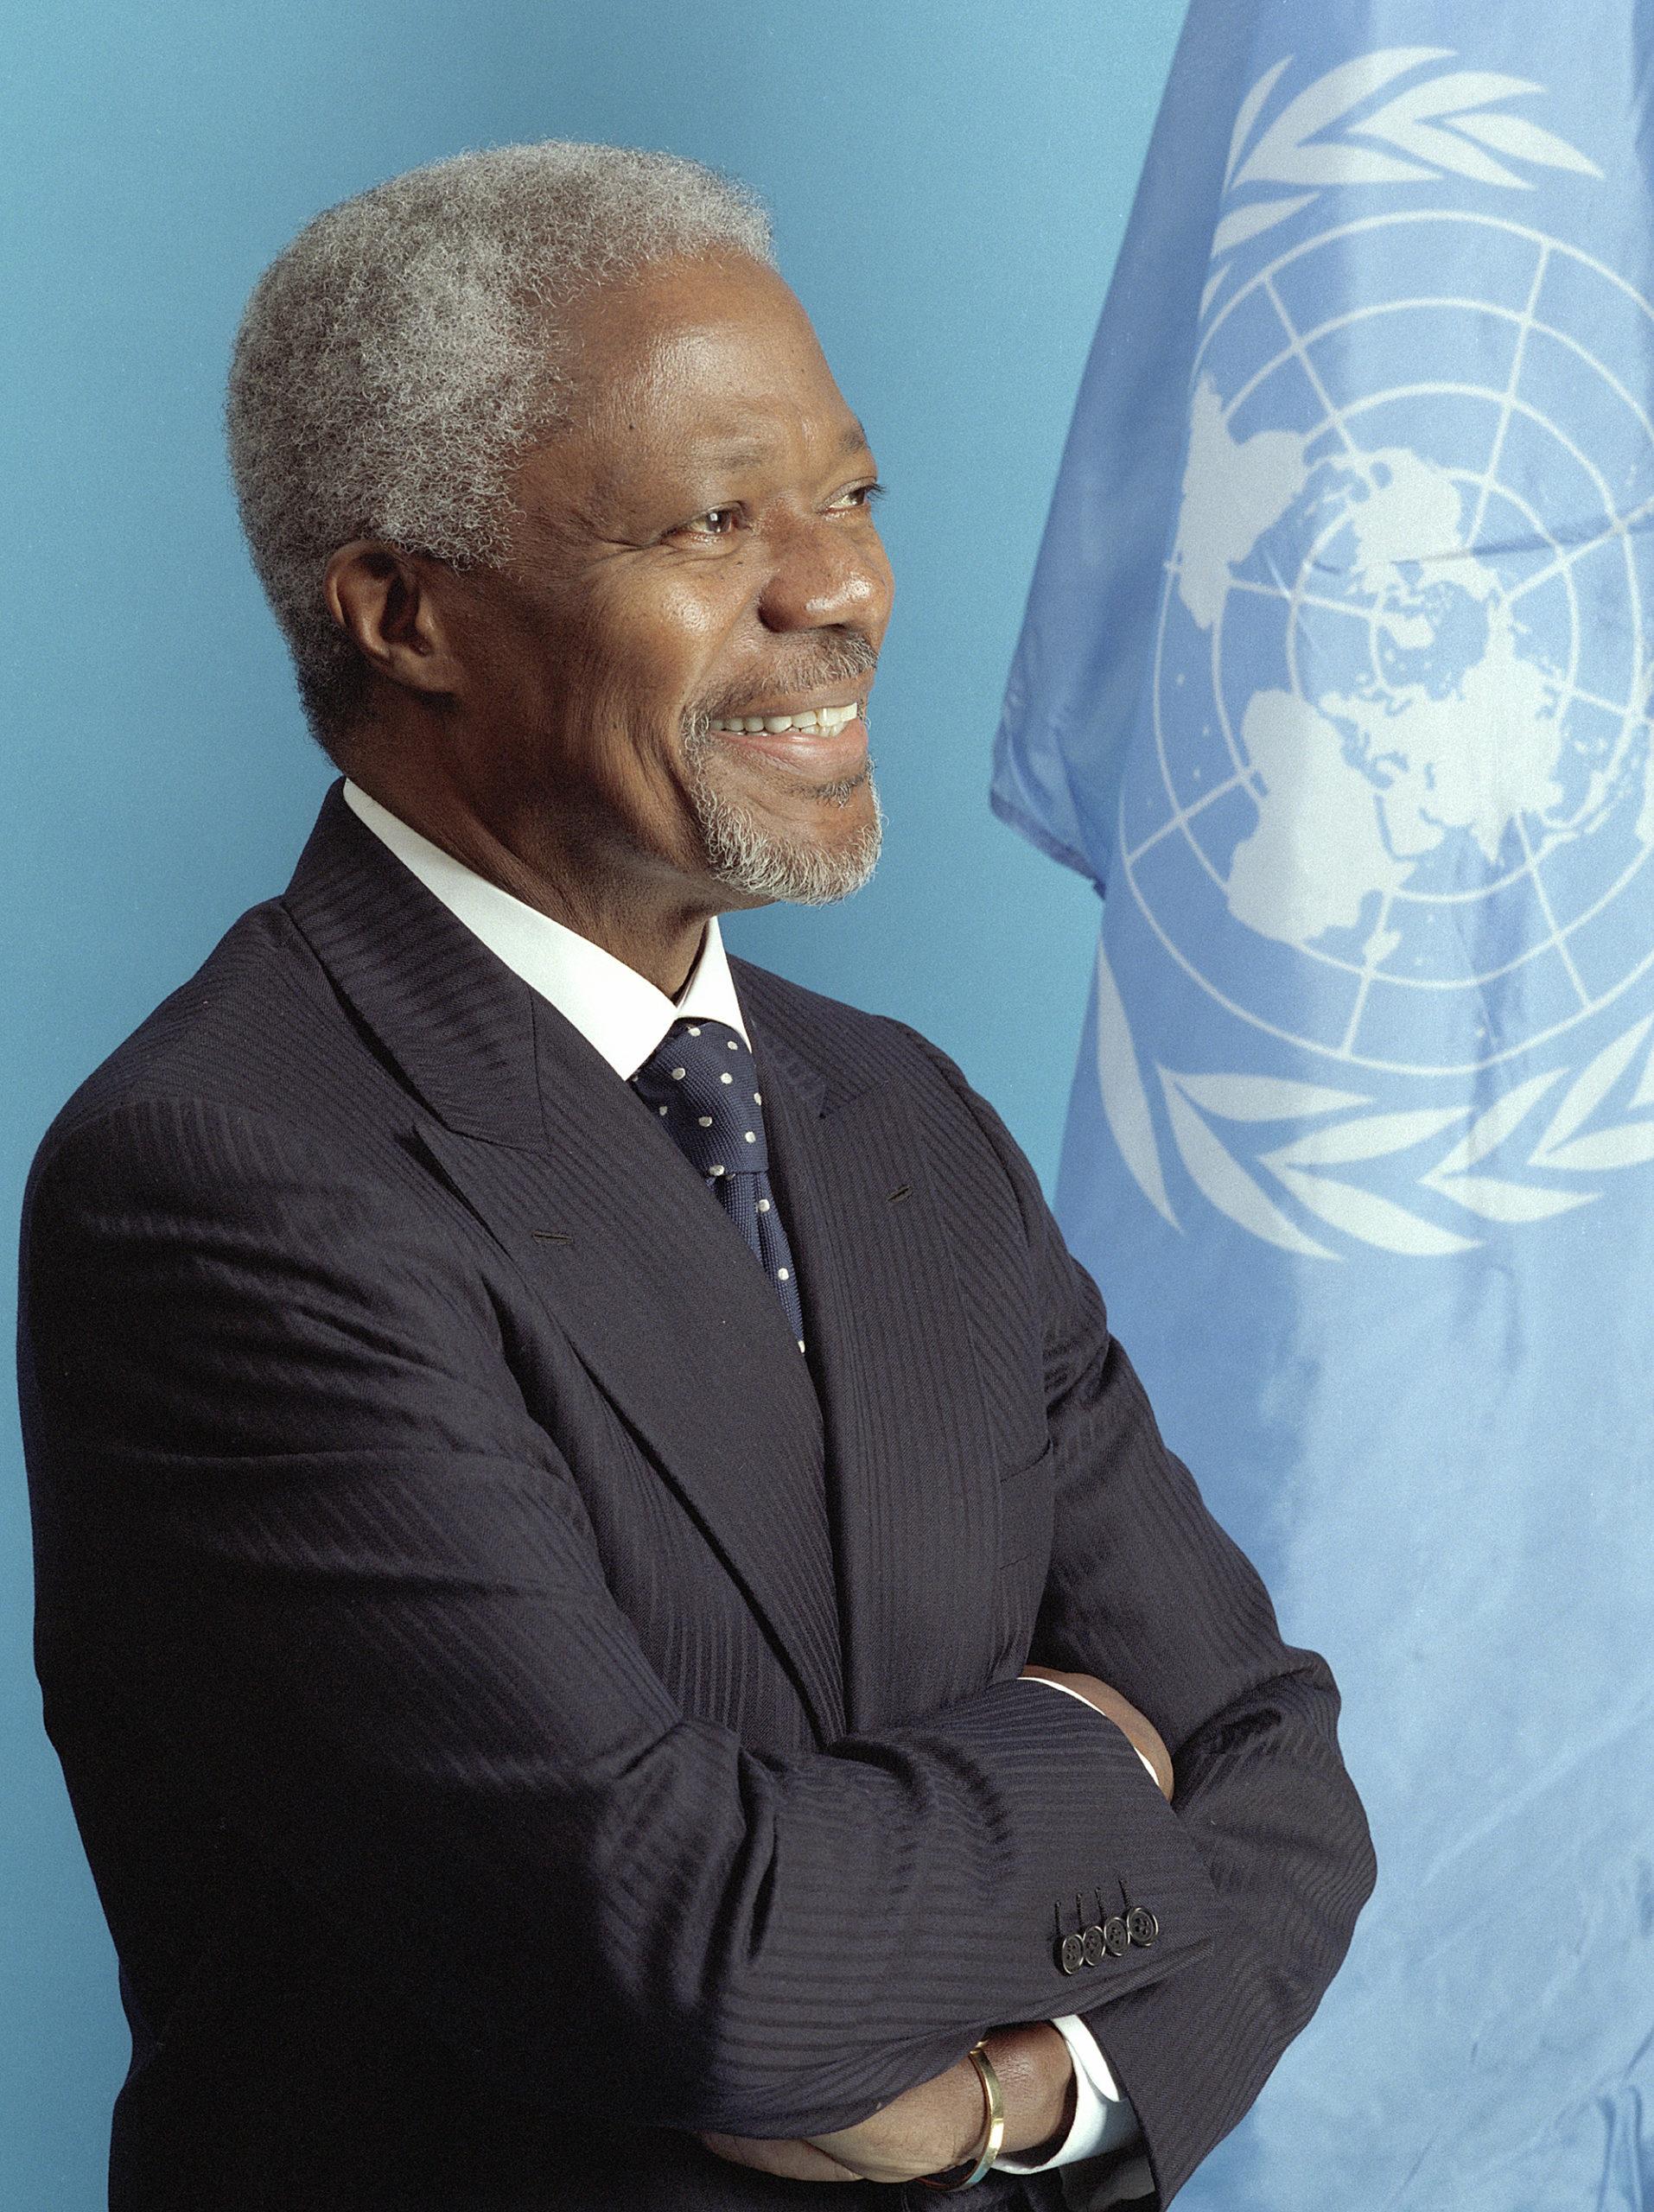 Kofi Annan_UN photo